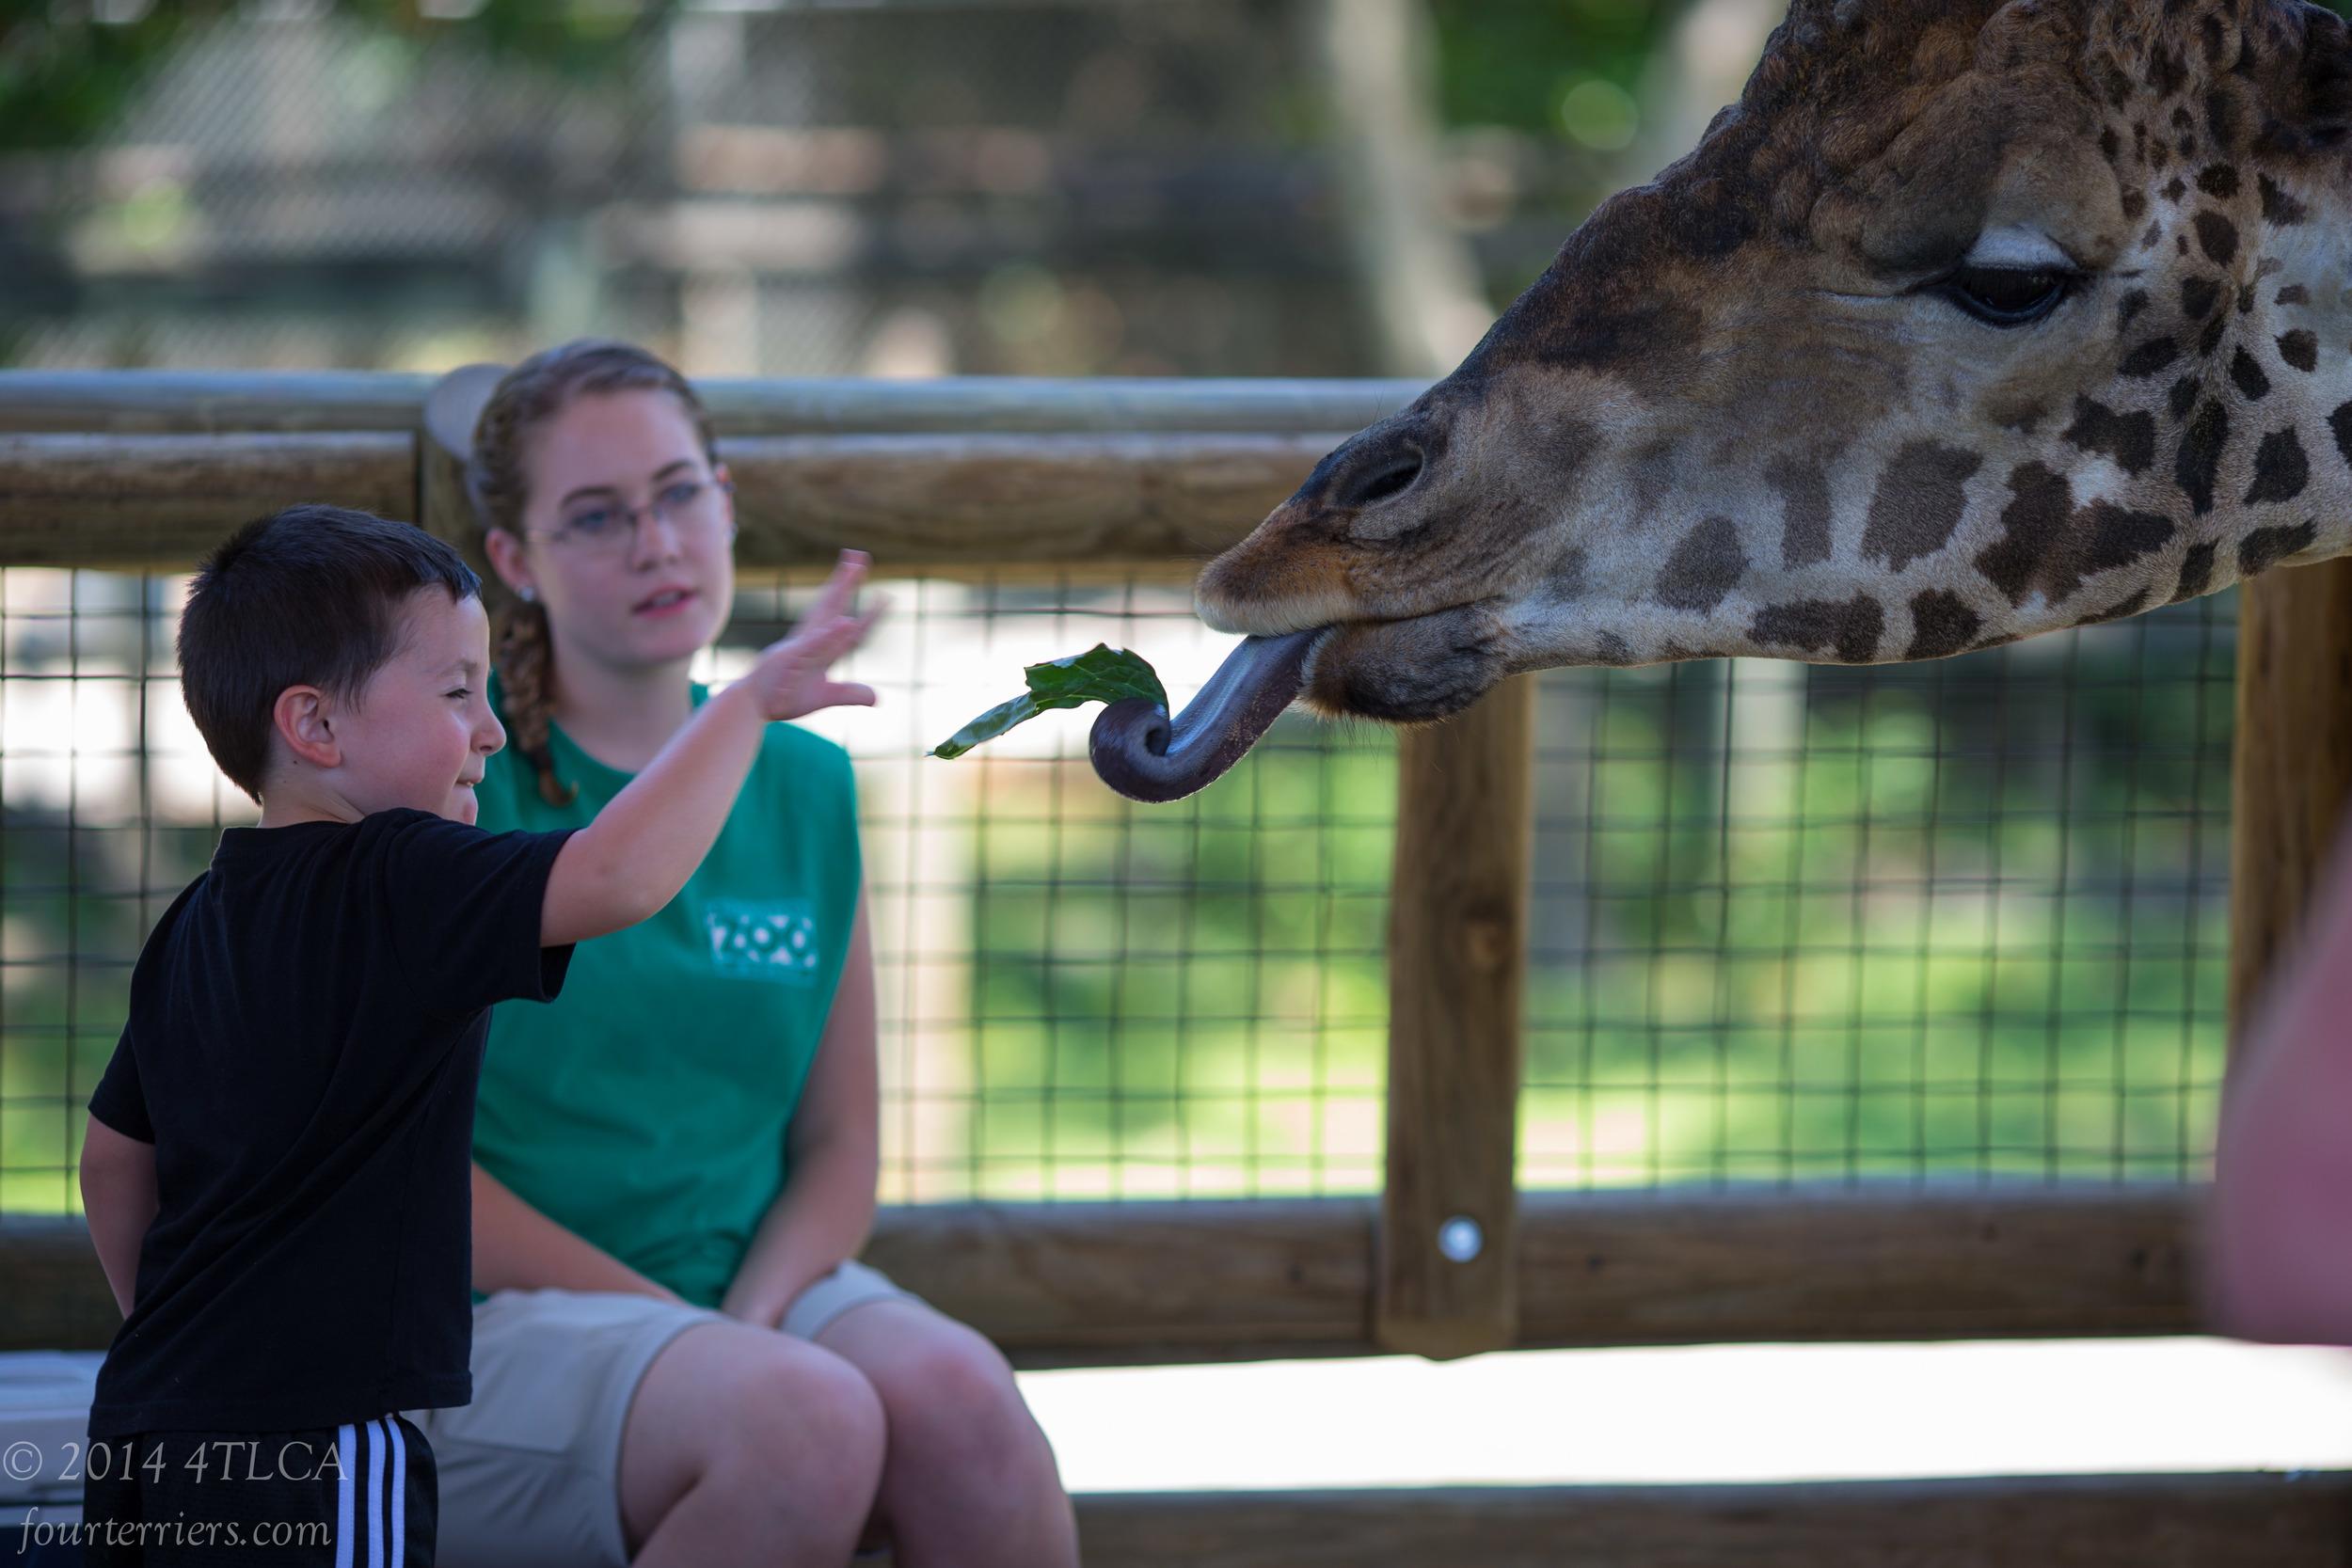 Feeding the Giraffe, Knoxville Zoo